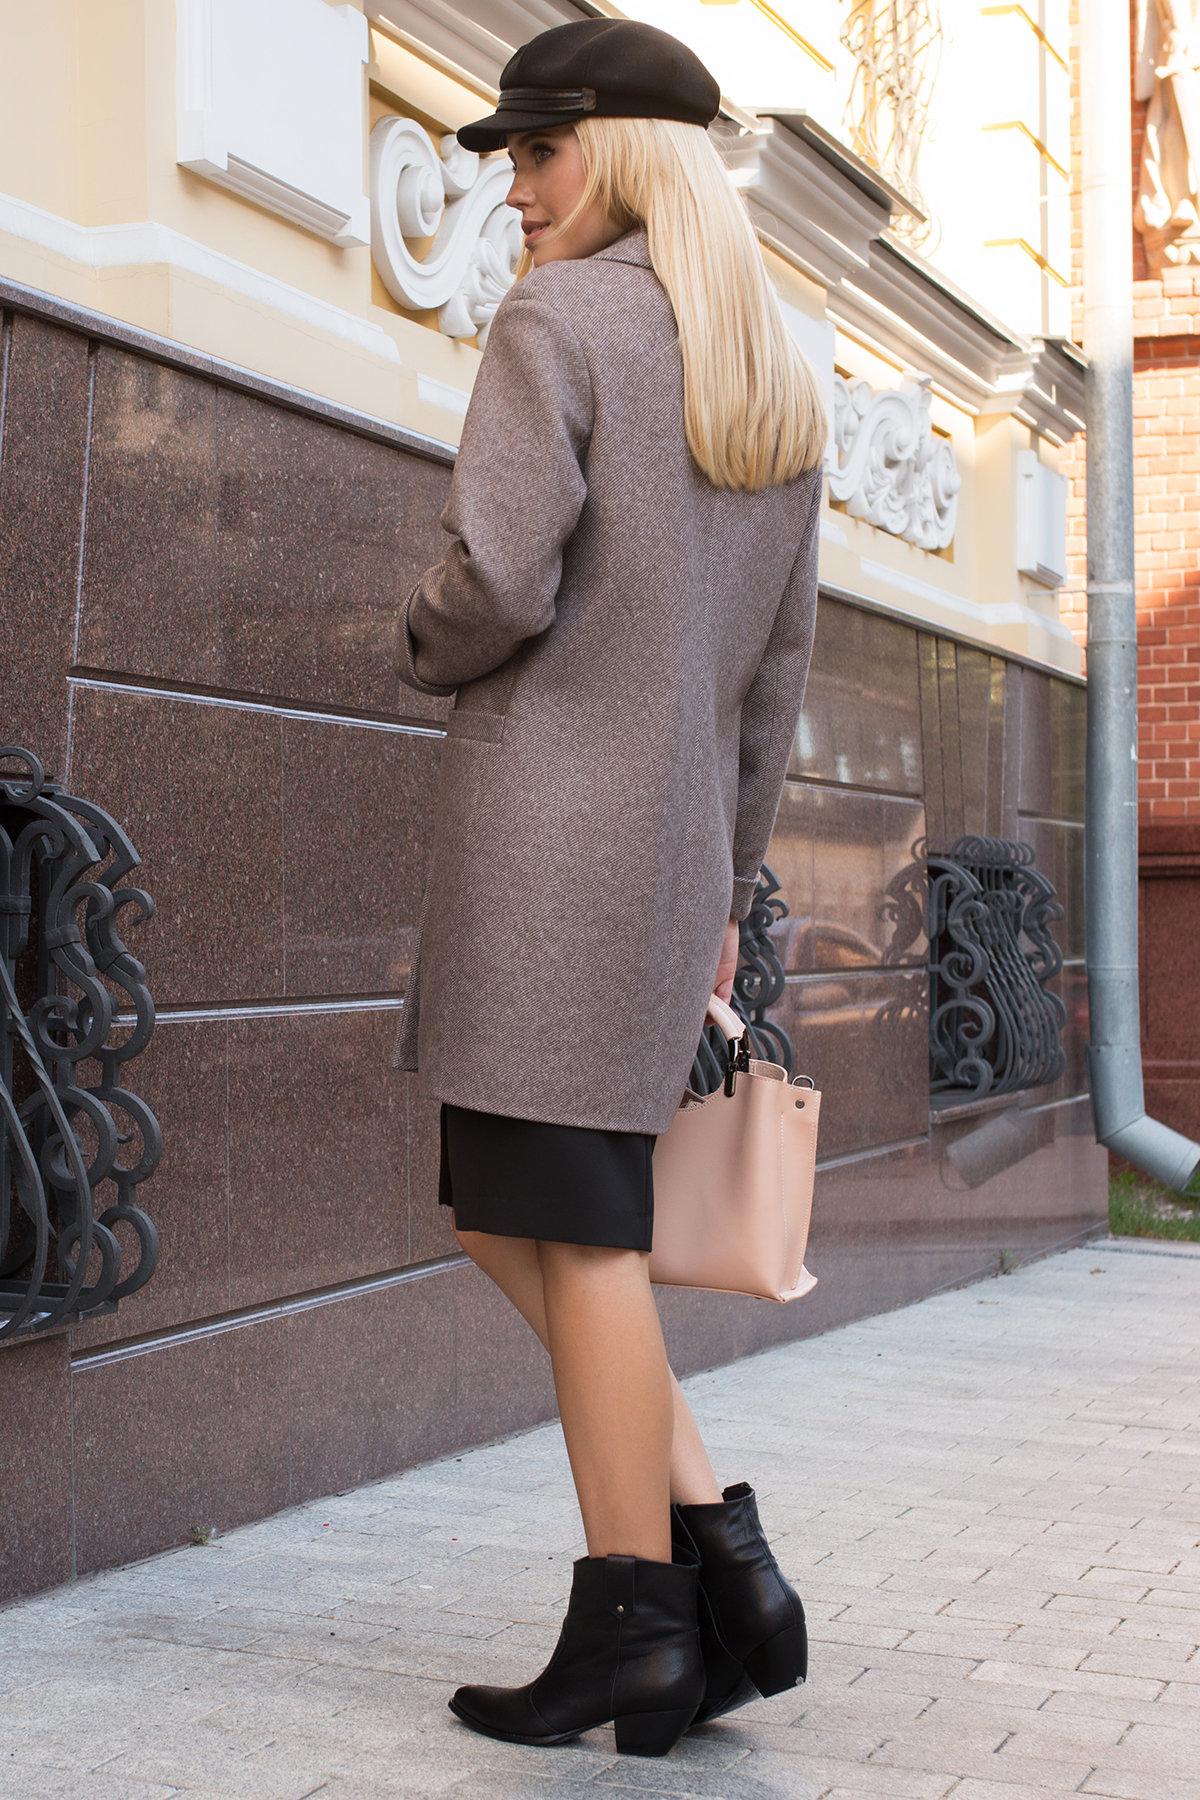 Пальто  Вива 7907 АРТ. 43863 Цвет: Шоколад - фото 3, интернет магазин tm-modus.ru